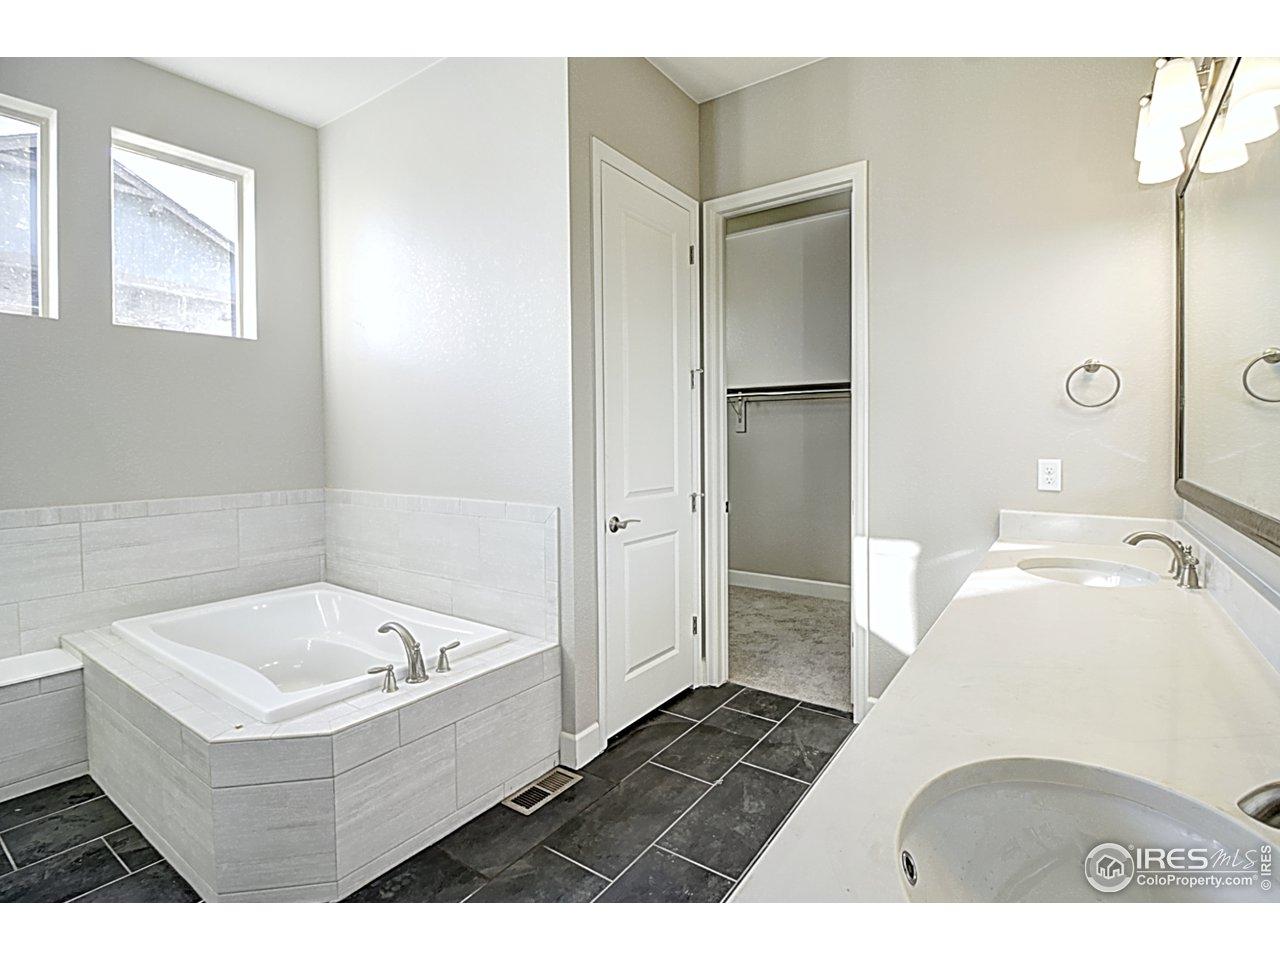 5-piece master bath